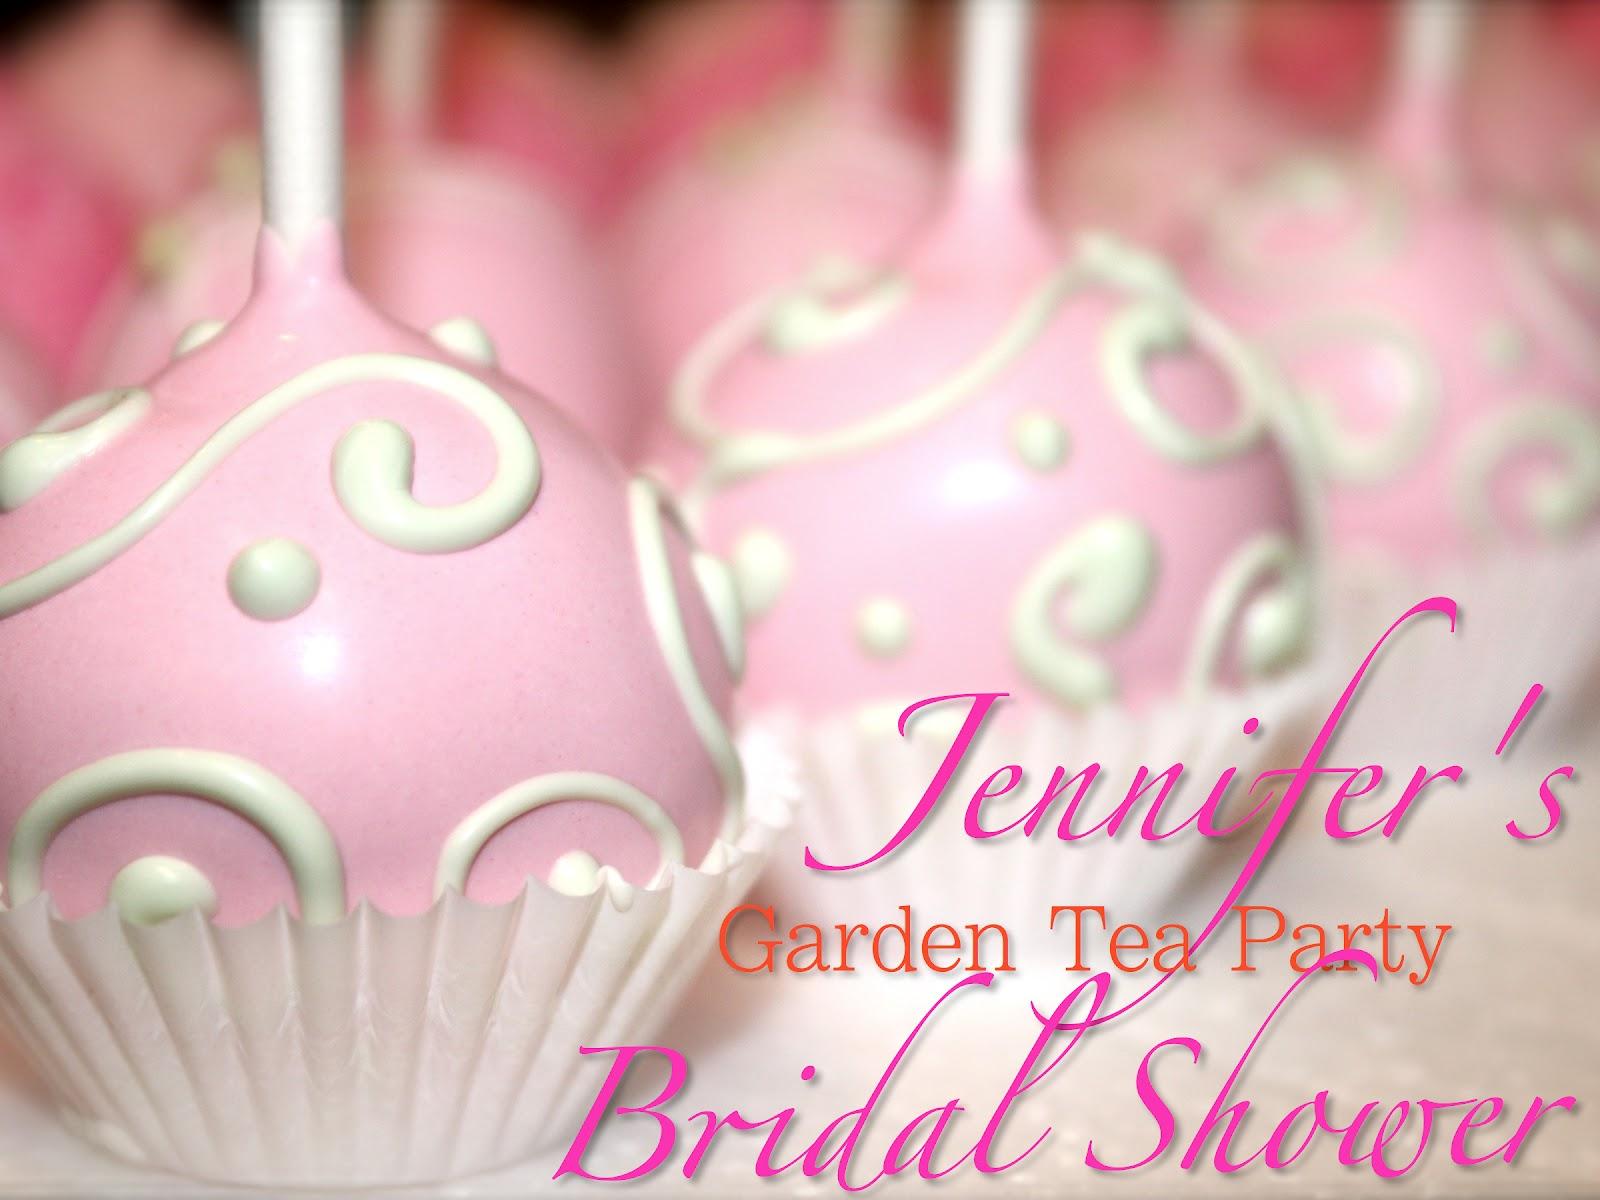 garden tea party treats jennifers wedding shower